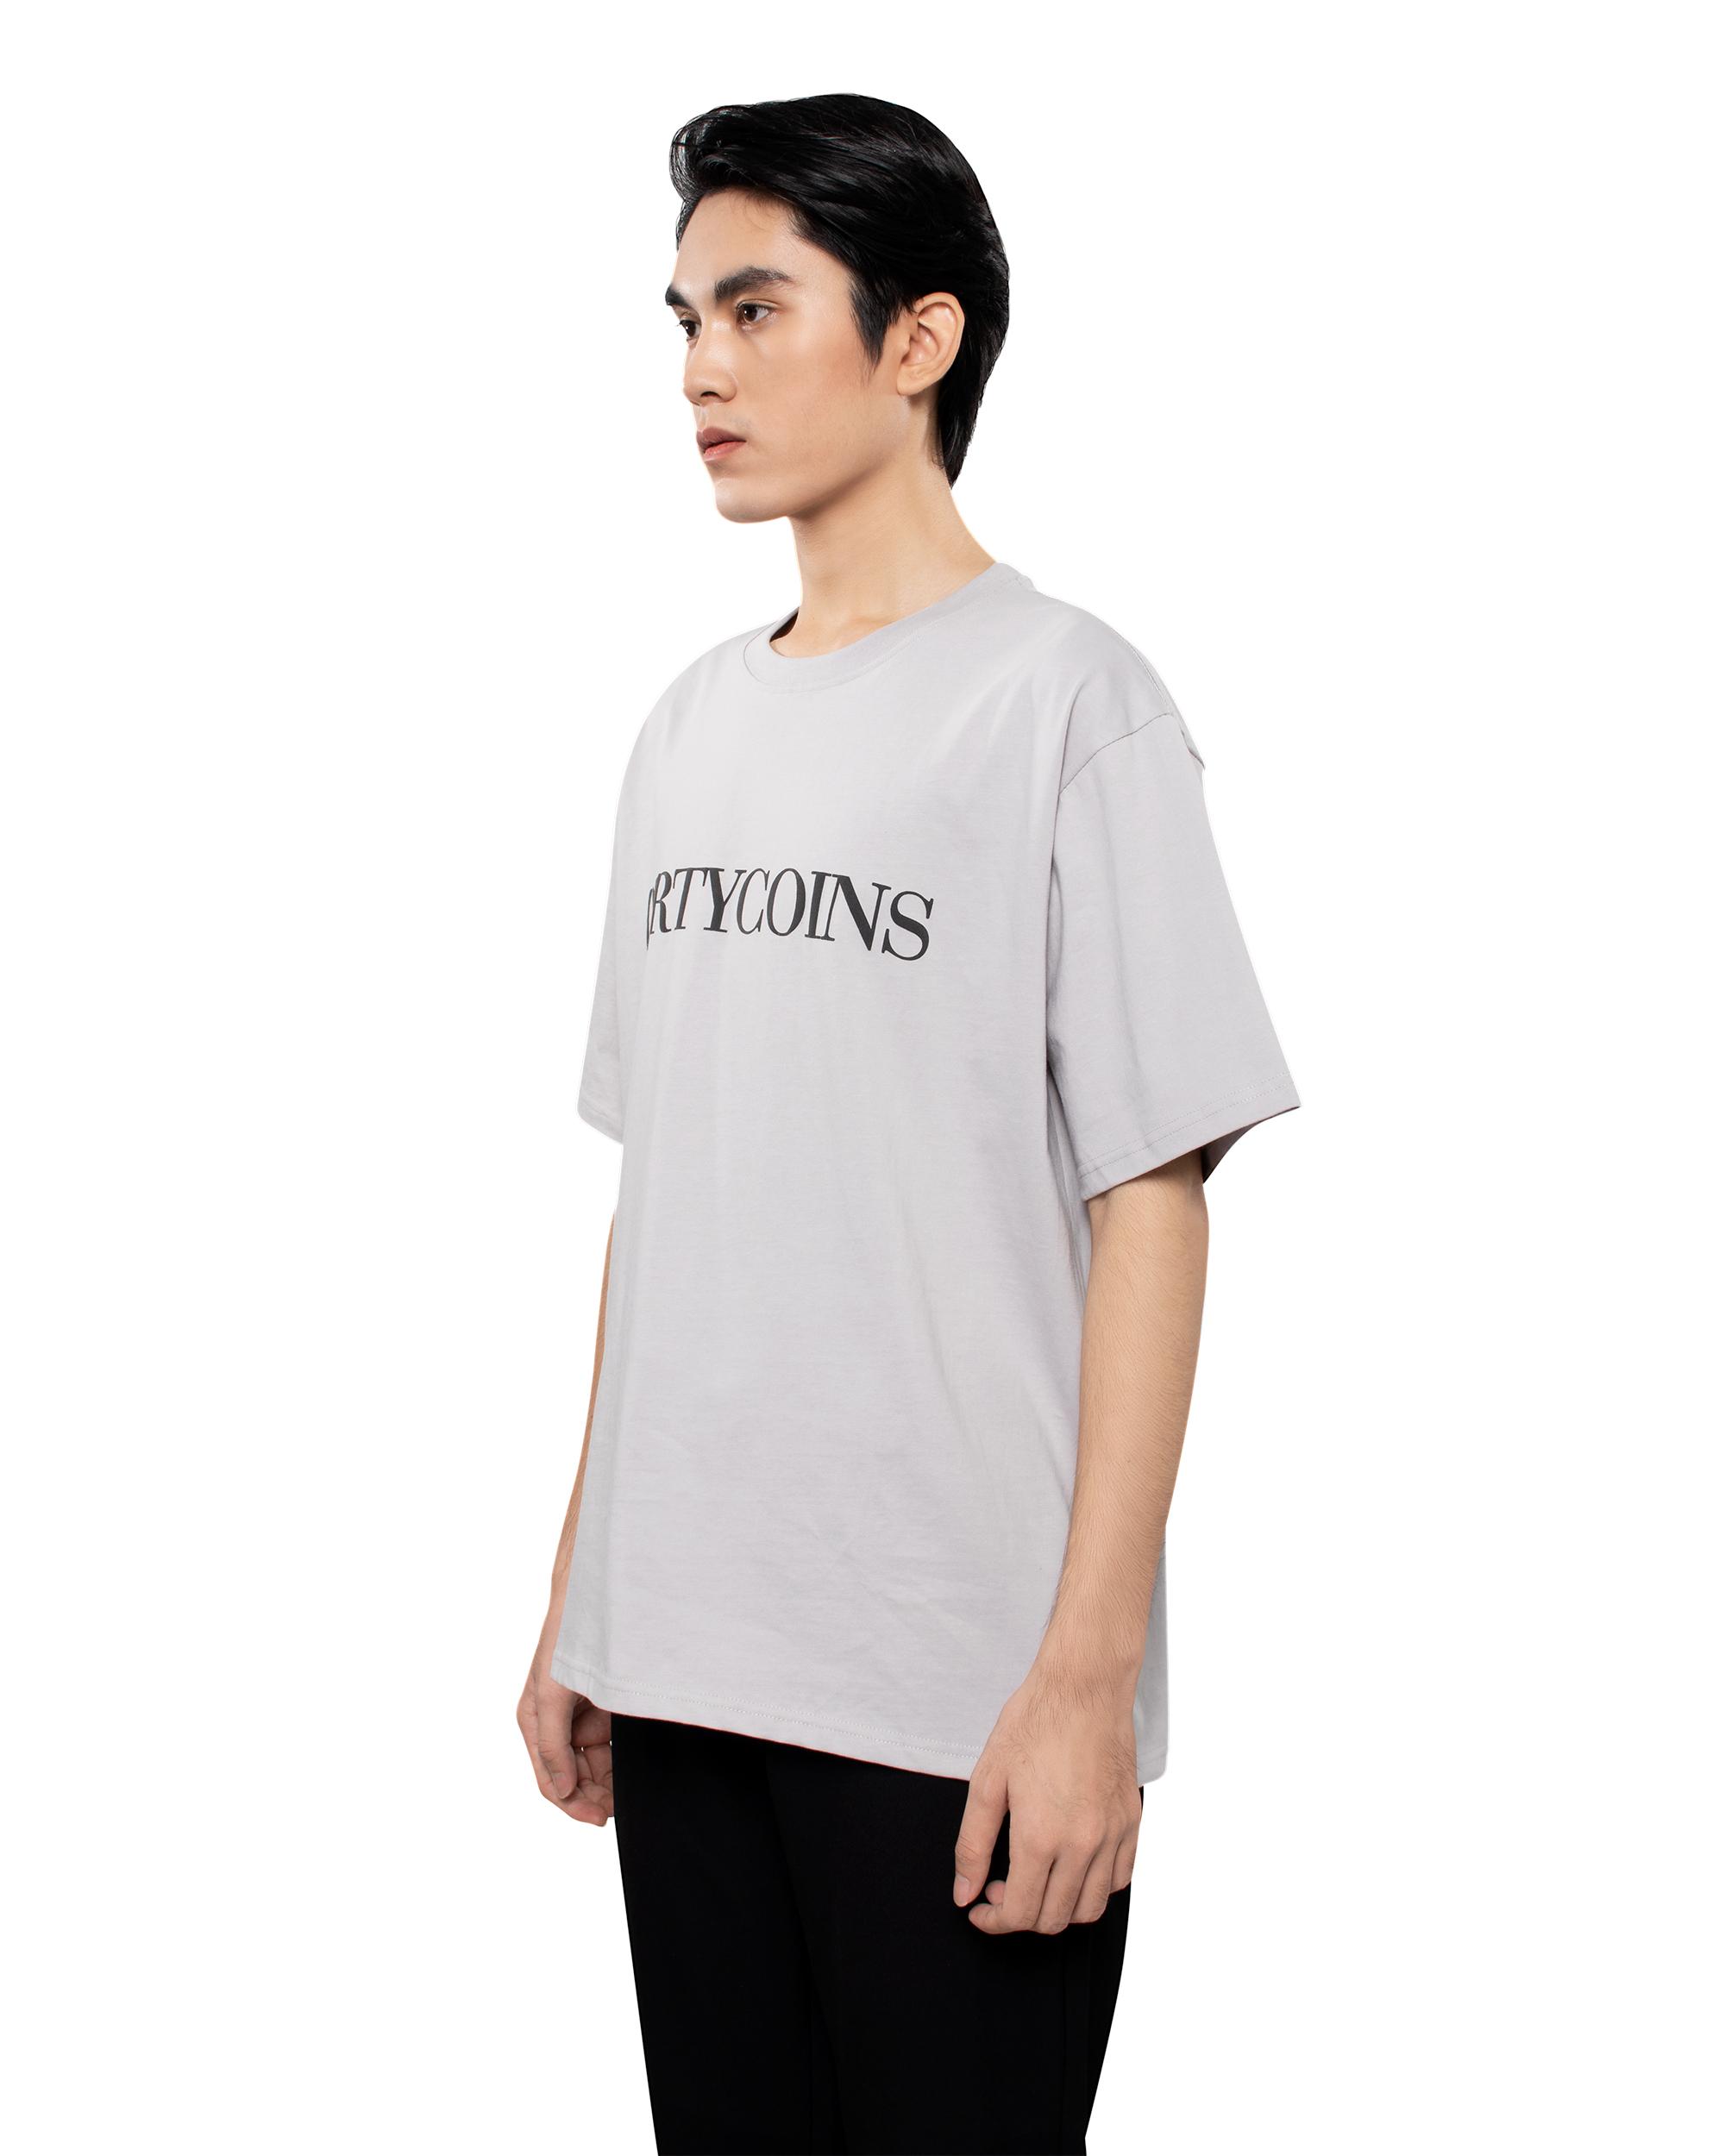 DirtyCoins Serif T-Shirt - Grey